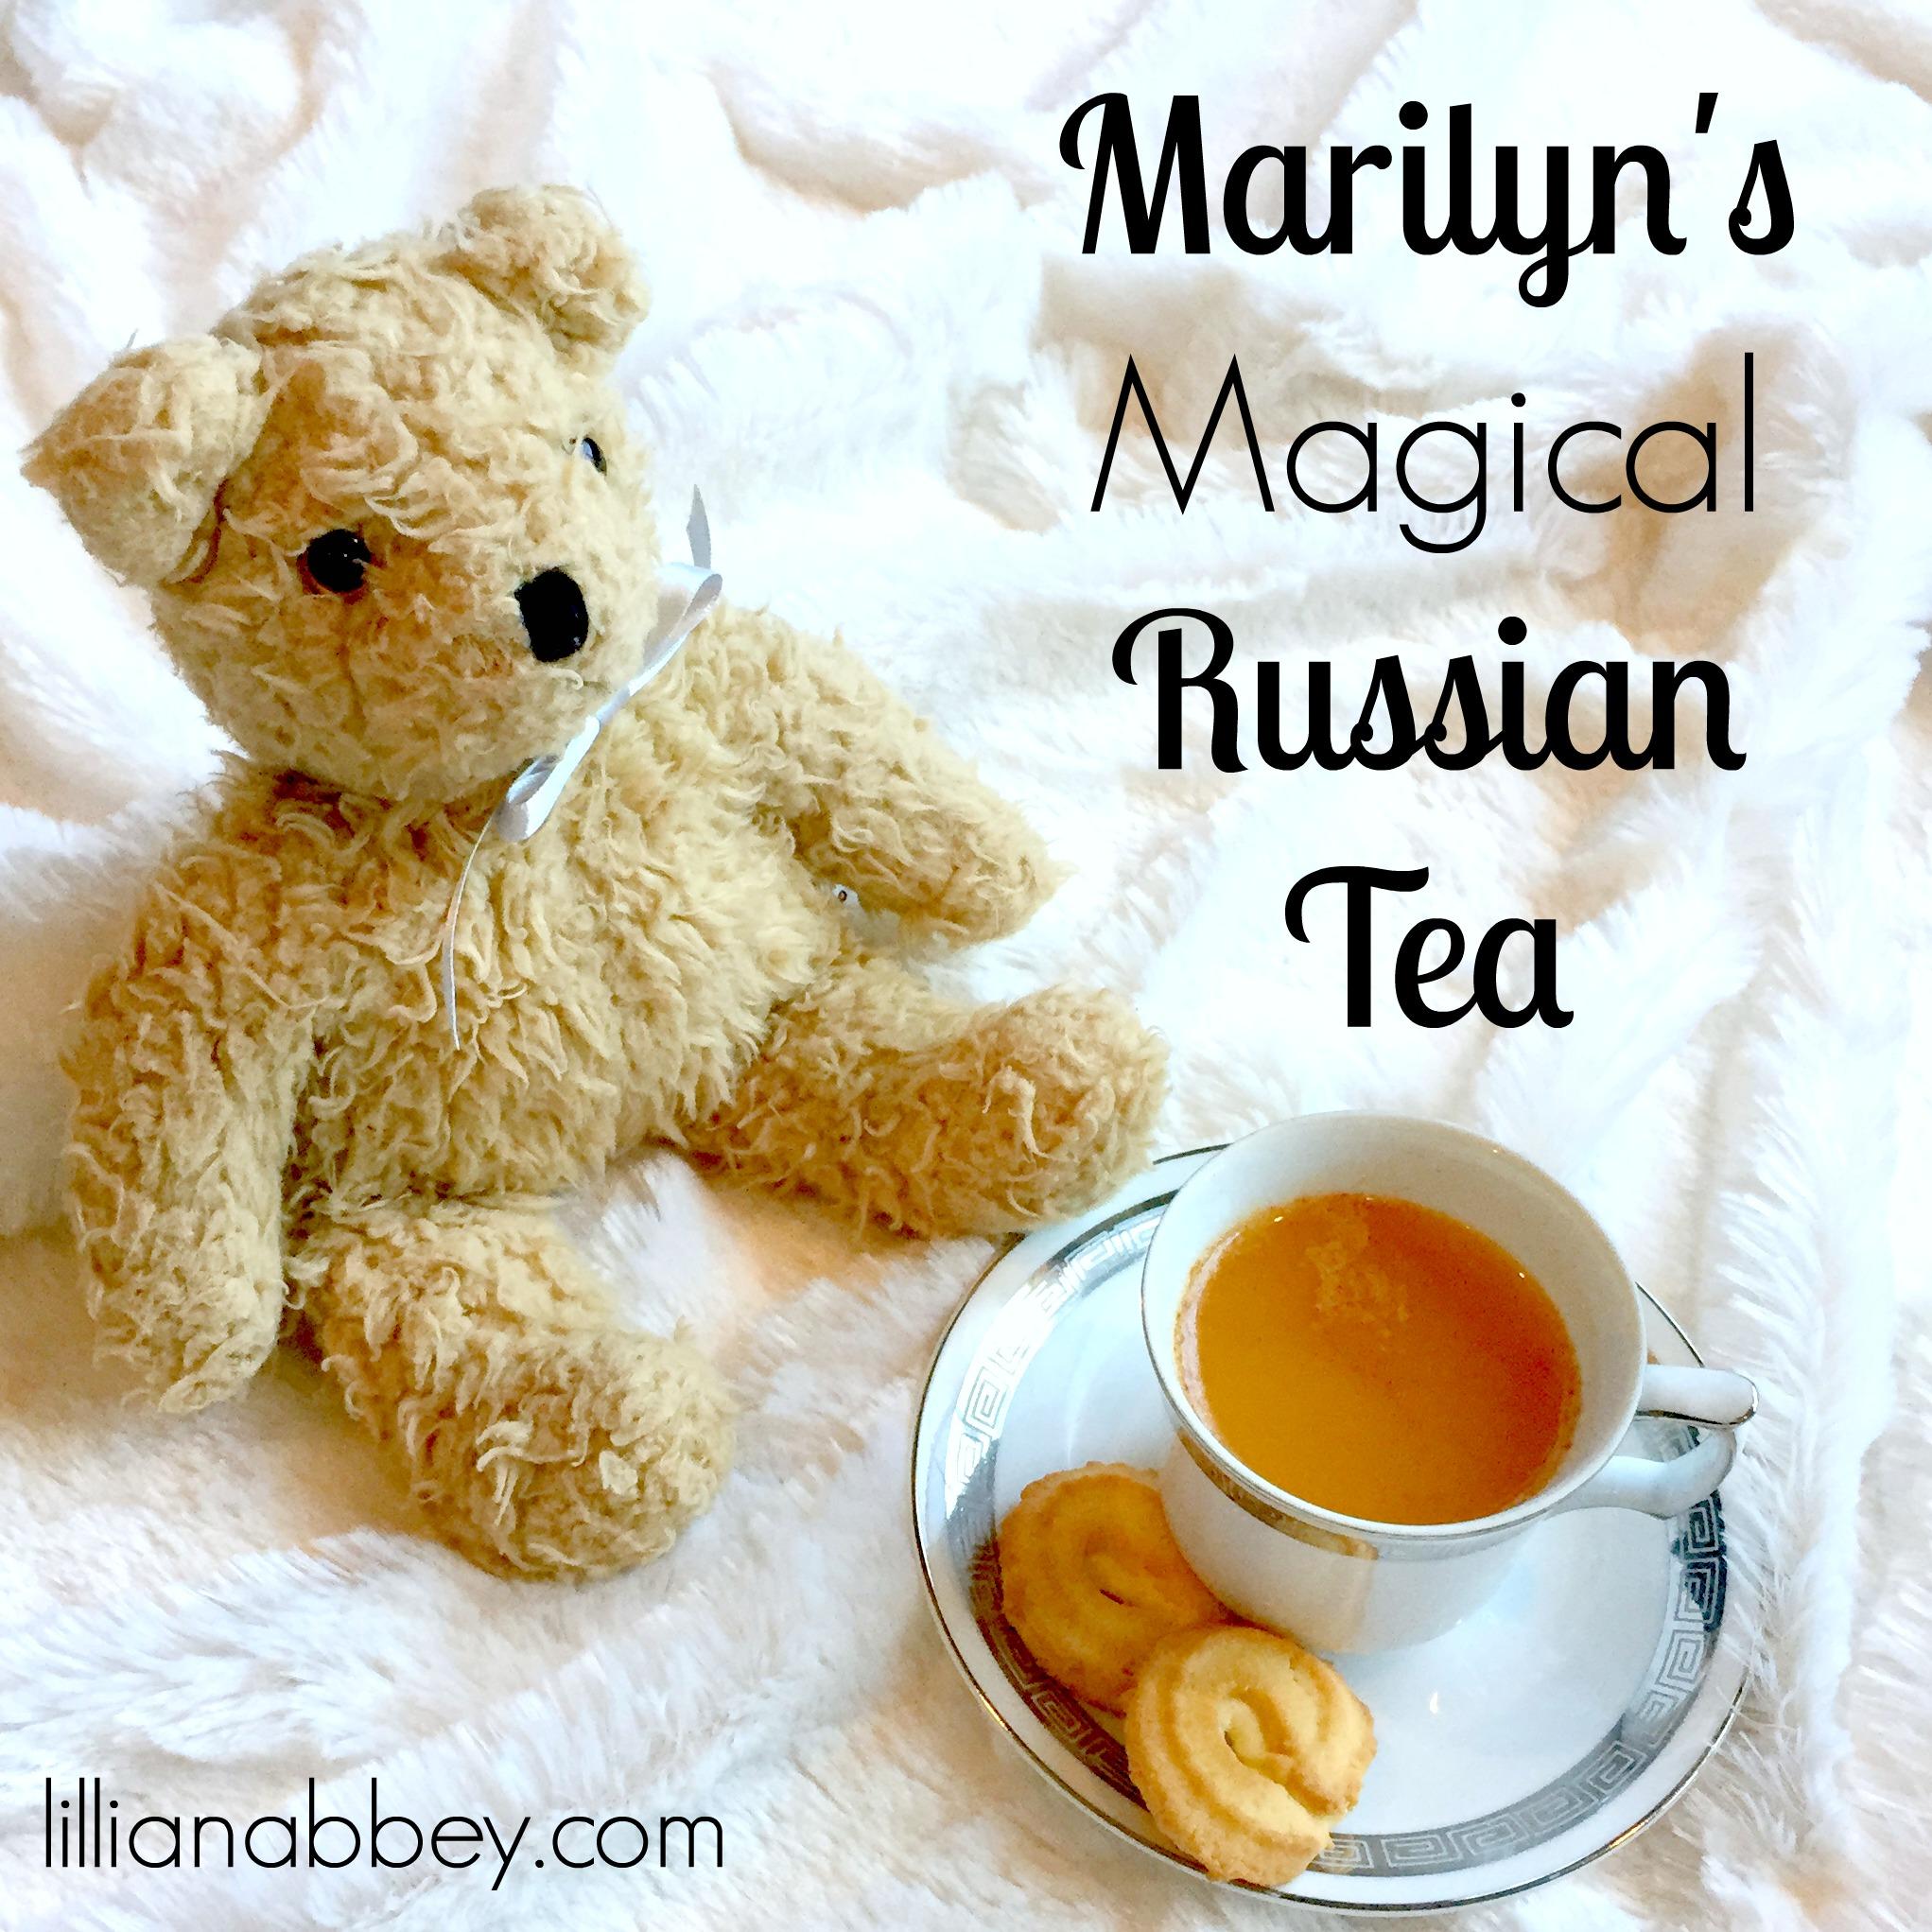 Marilyn's Magical Russian Tea